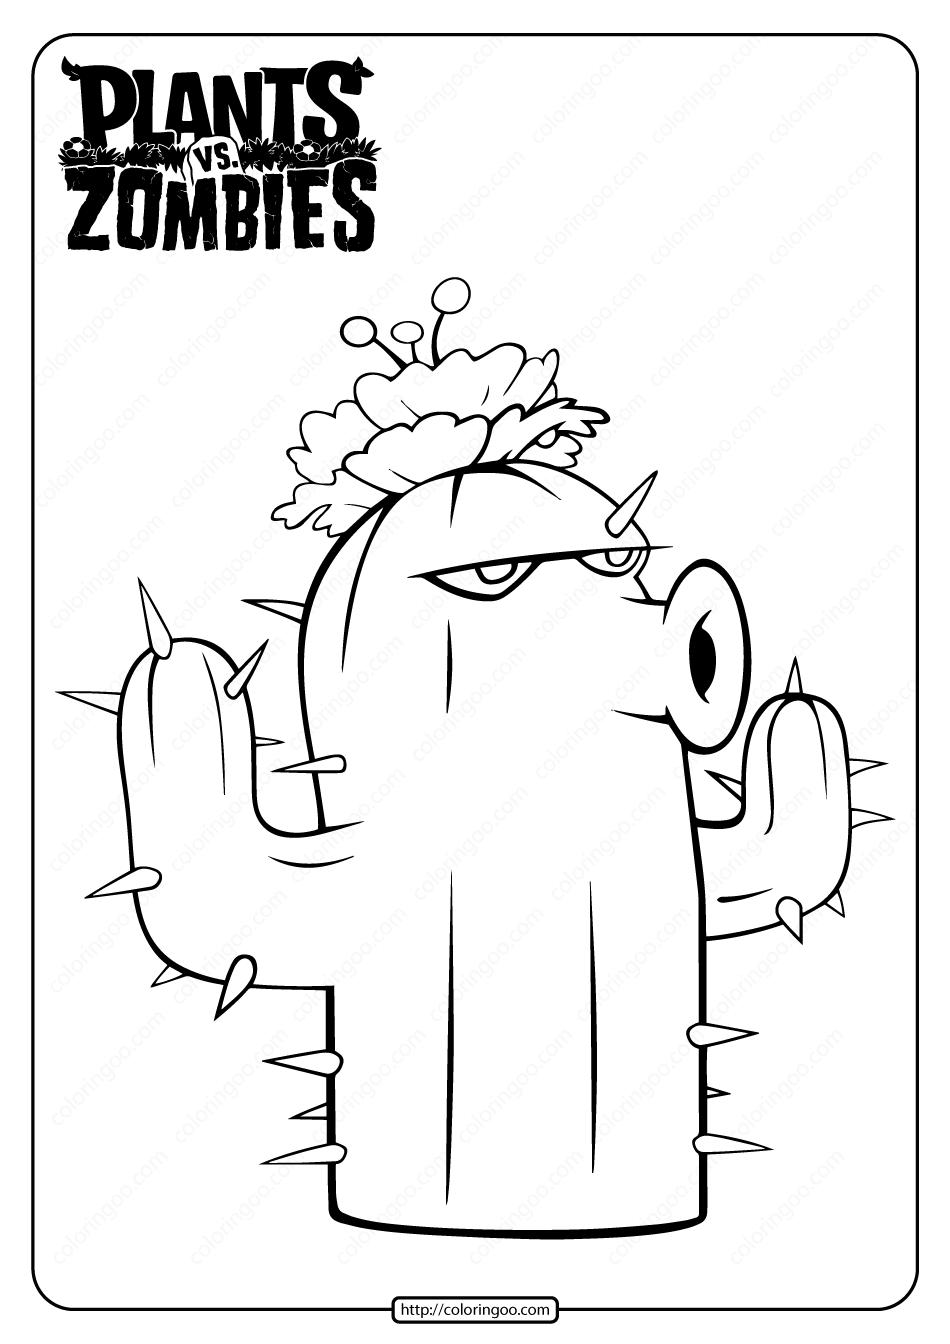 Free Plants vs Zombies Cactus Pdf Coloring Page